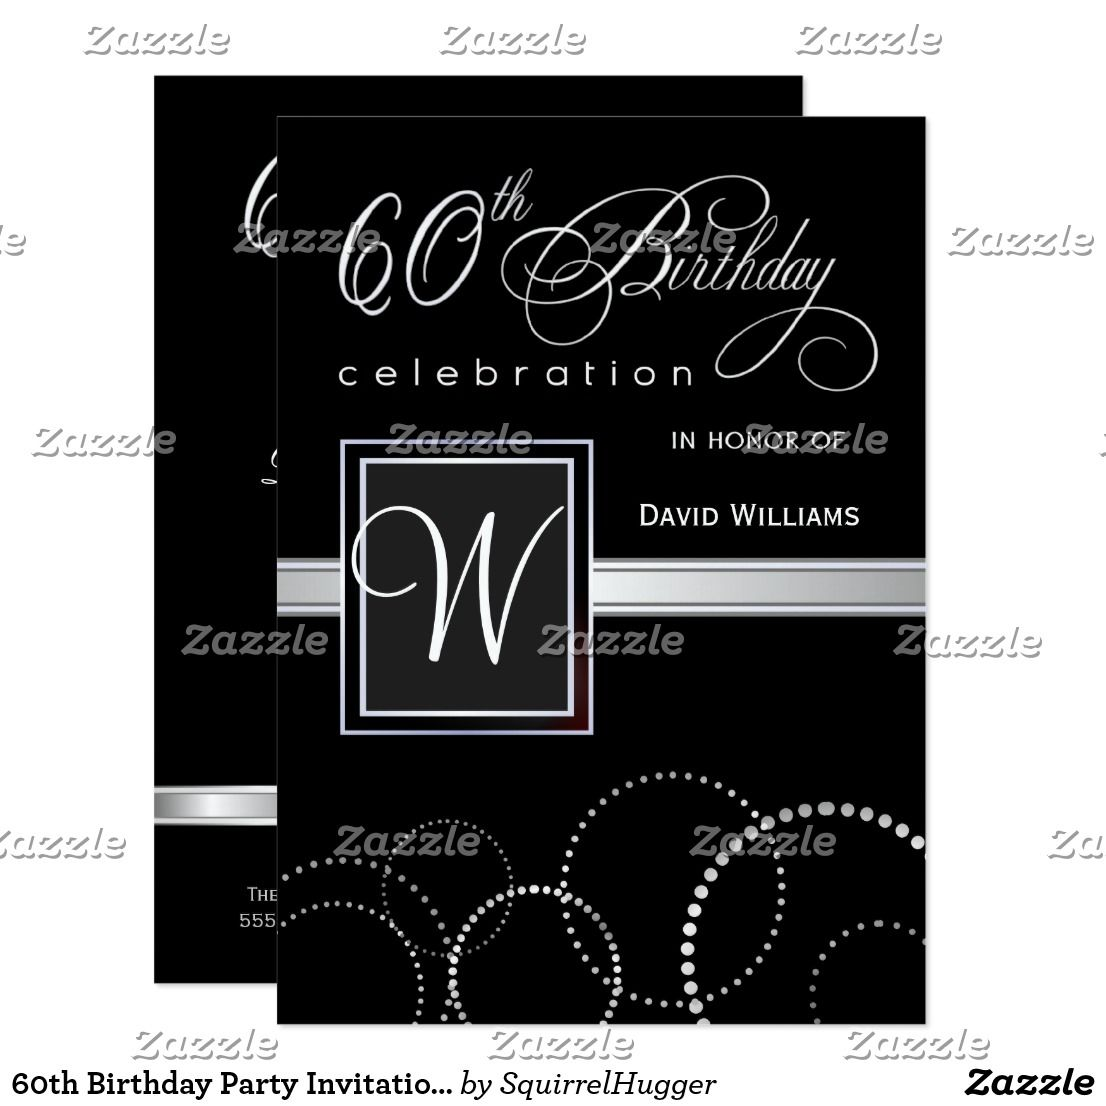 60th Birthday Party Invitations - with Monogram | Birthday Invites ...